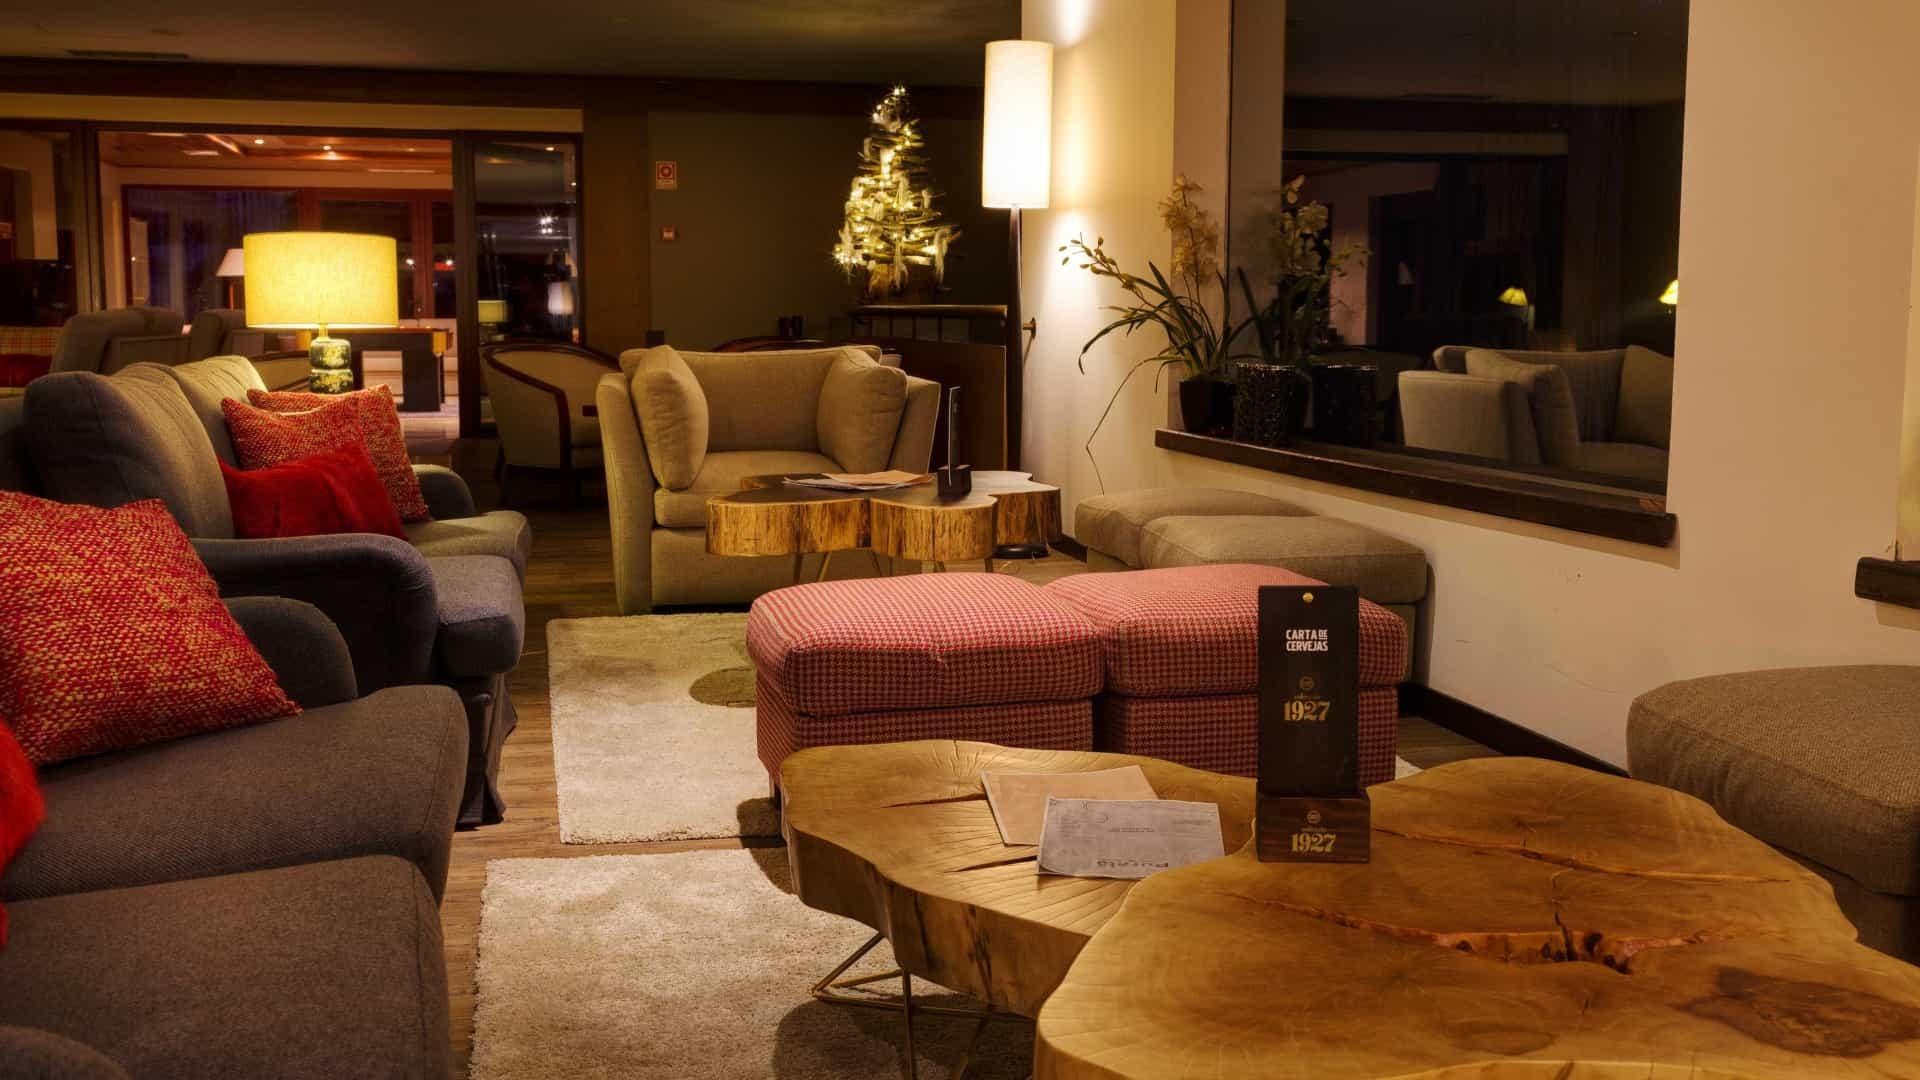 Puralã Wool Valley Hotel: Serra da Estrela's Comfort puralã wool valley hotel Puralã Wool Valley Hotel: Serra da Estrela's Comfort naom 5a1fe67d307c0